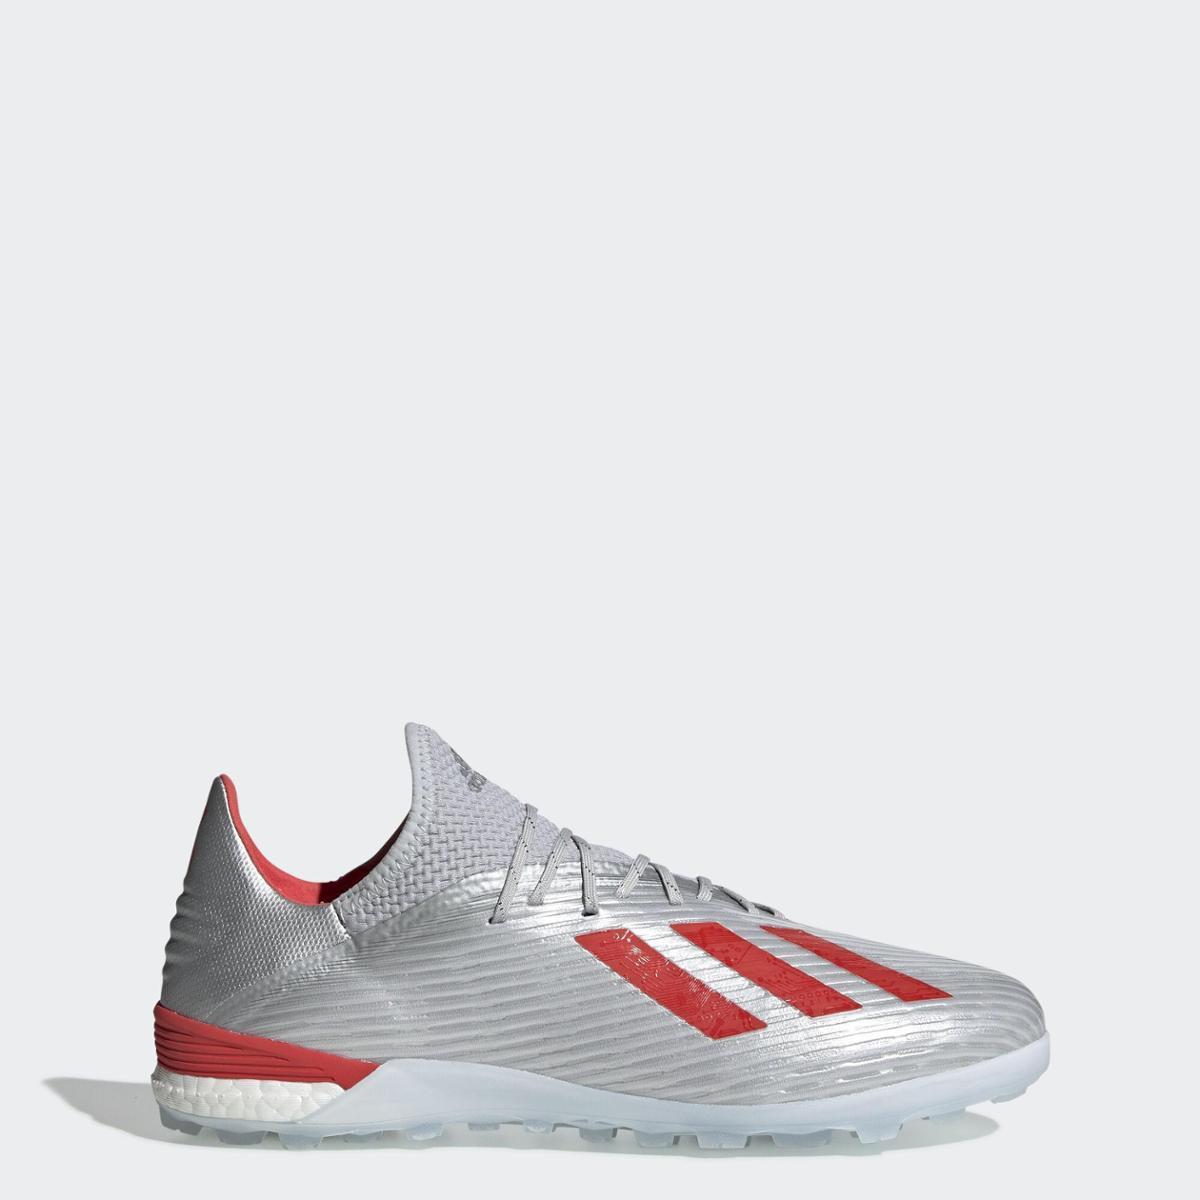 Chuteira Society Adidas X 19.1 - Prata